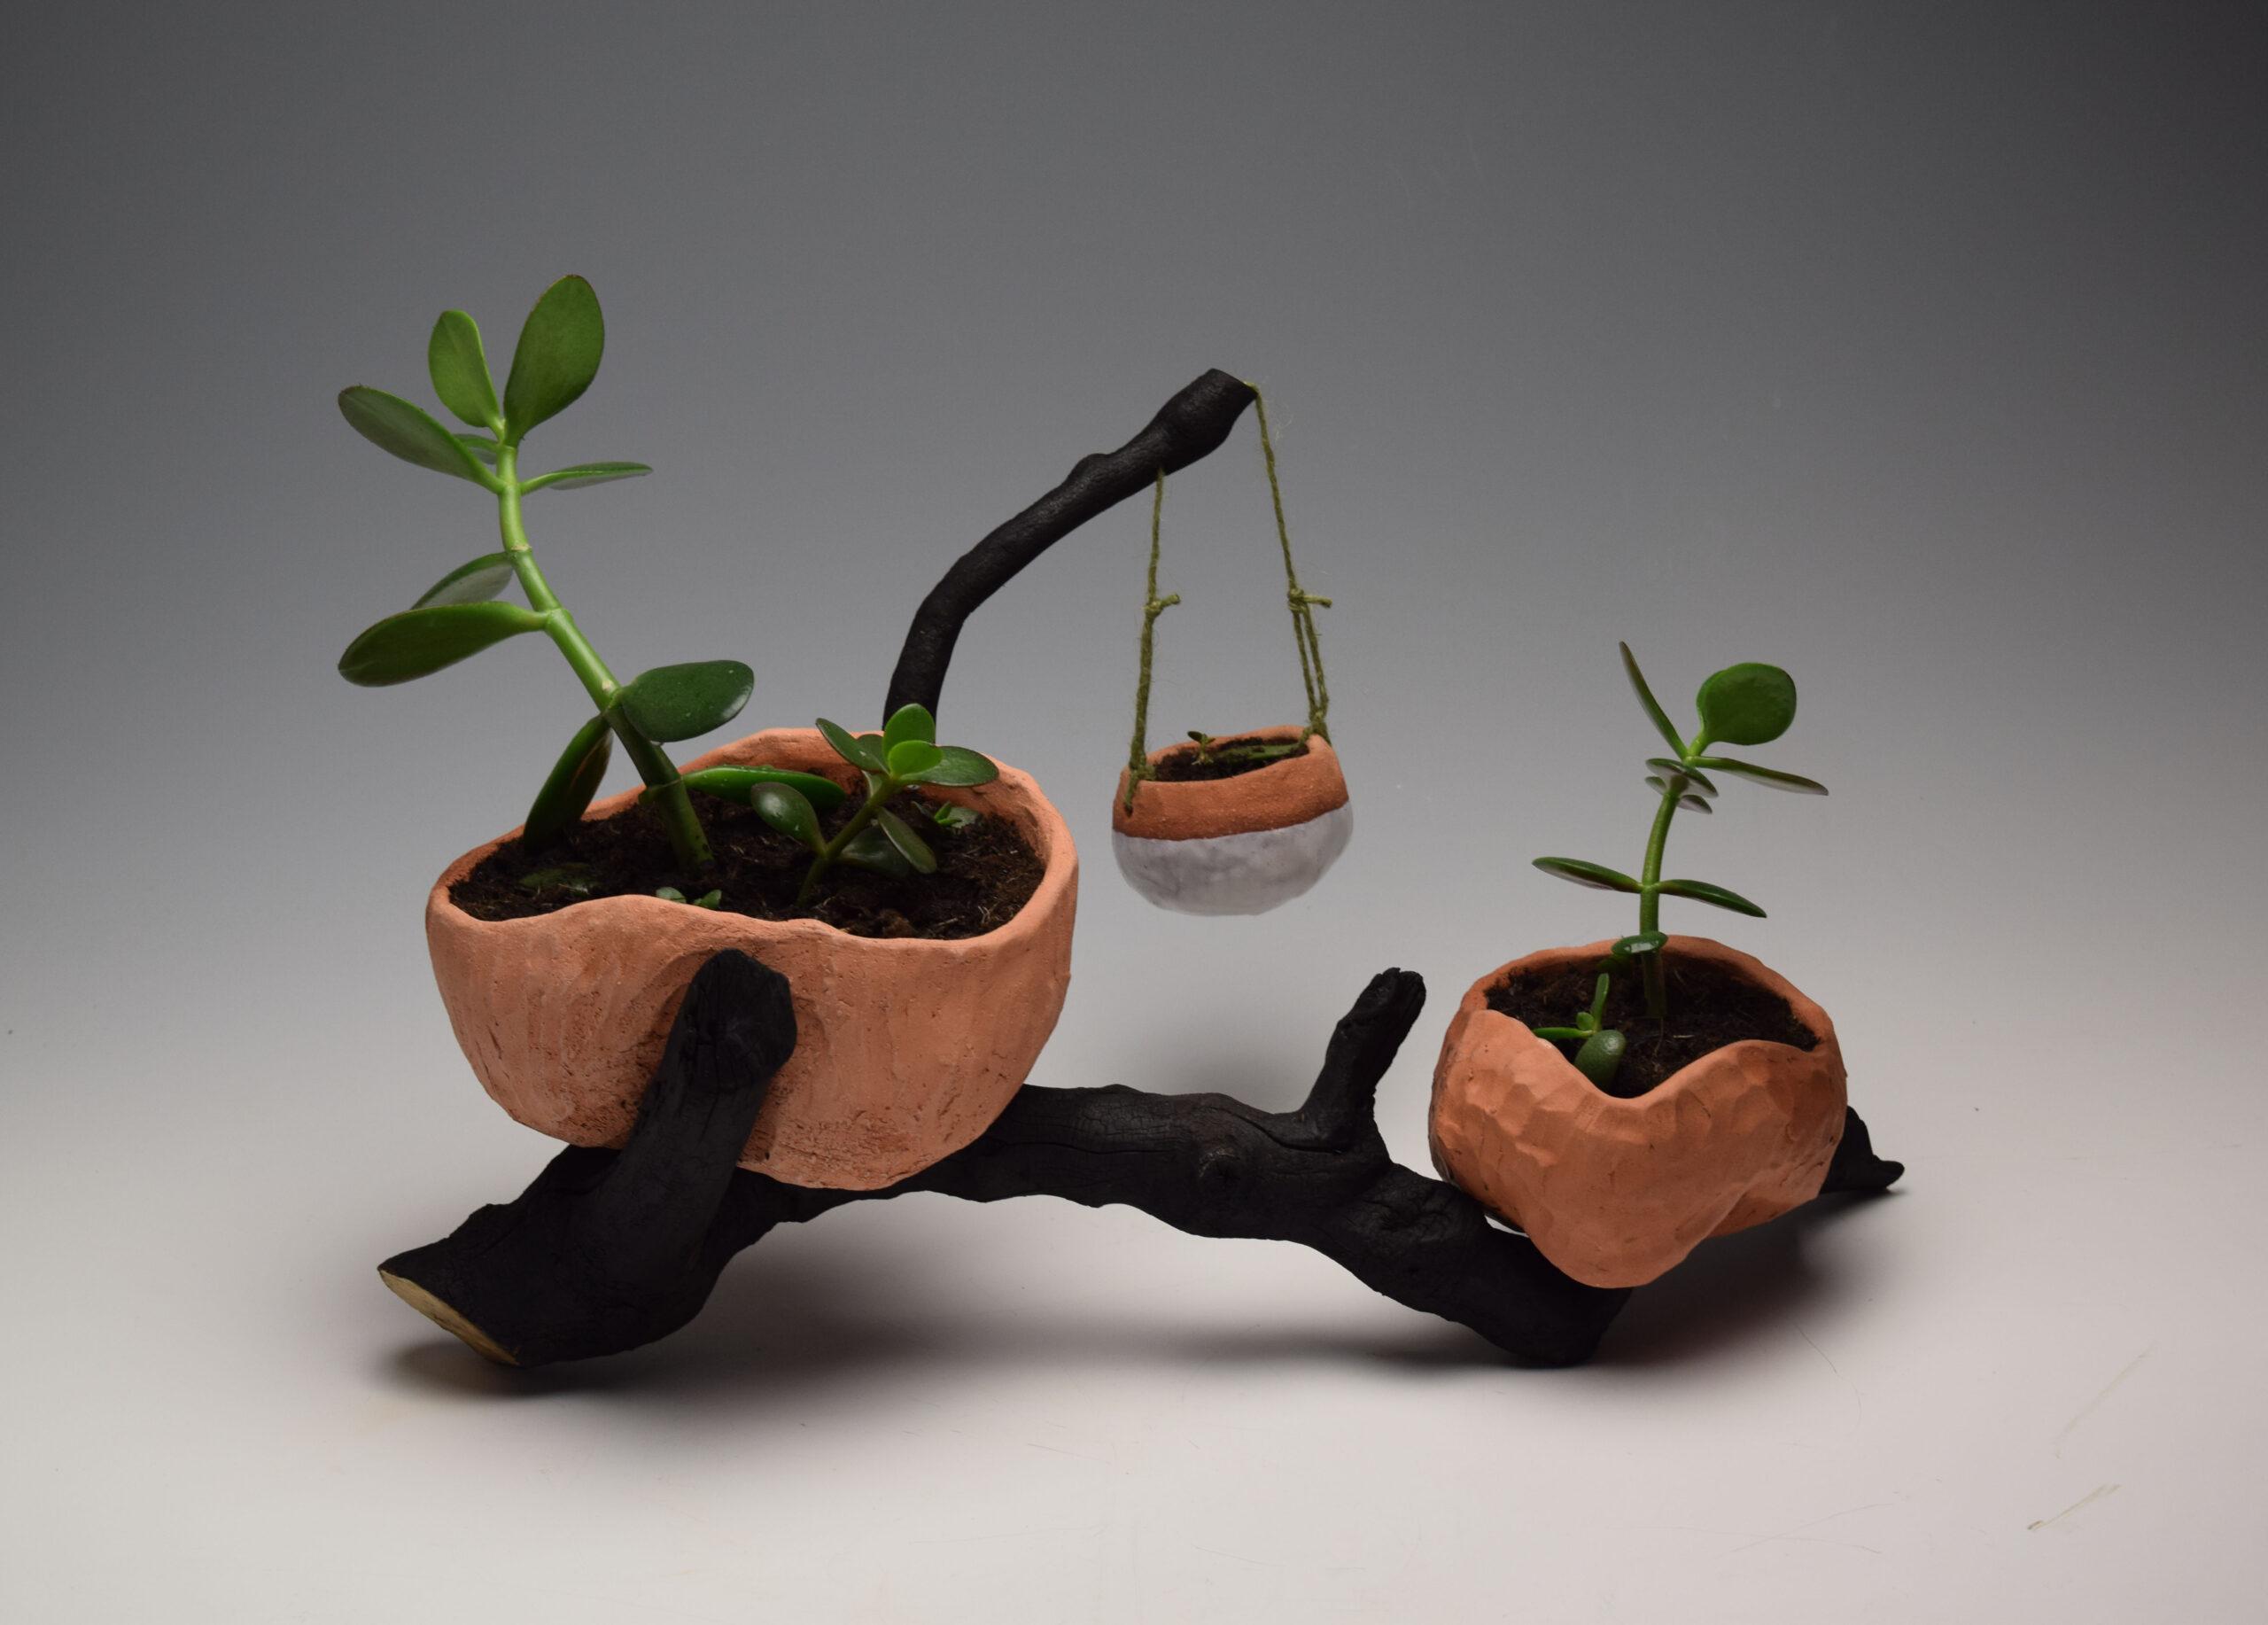 Balancing ceramic pots on burnt branch